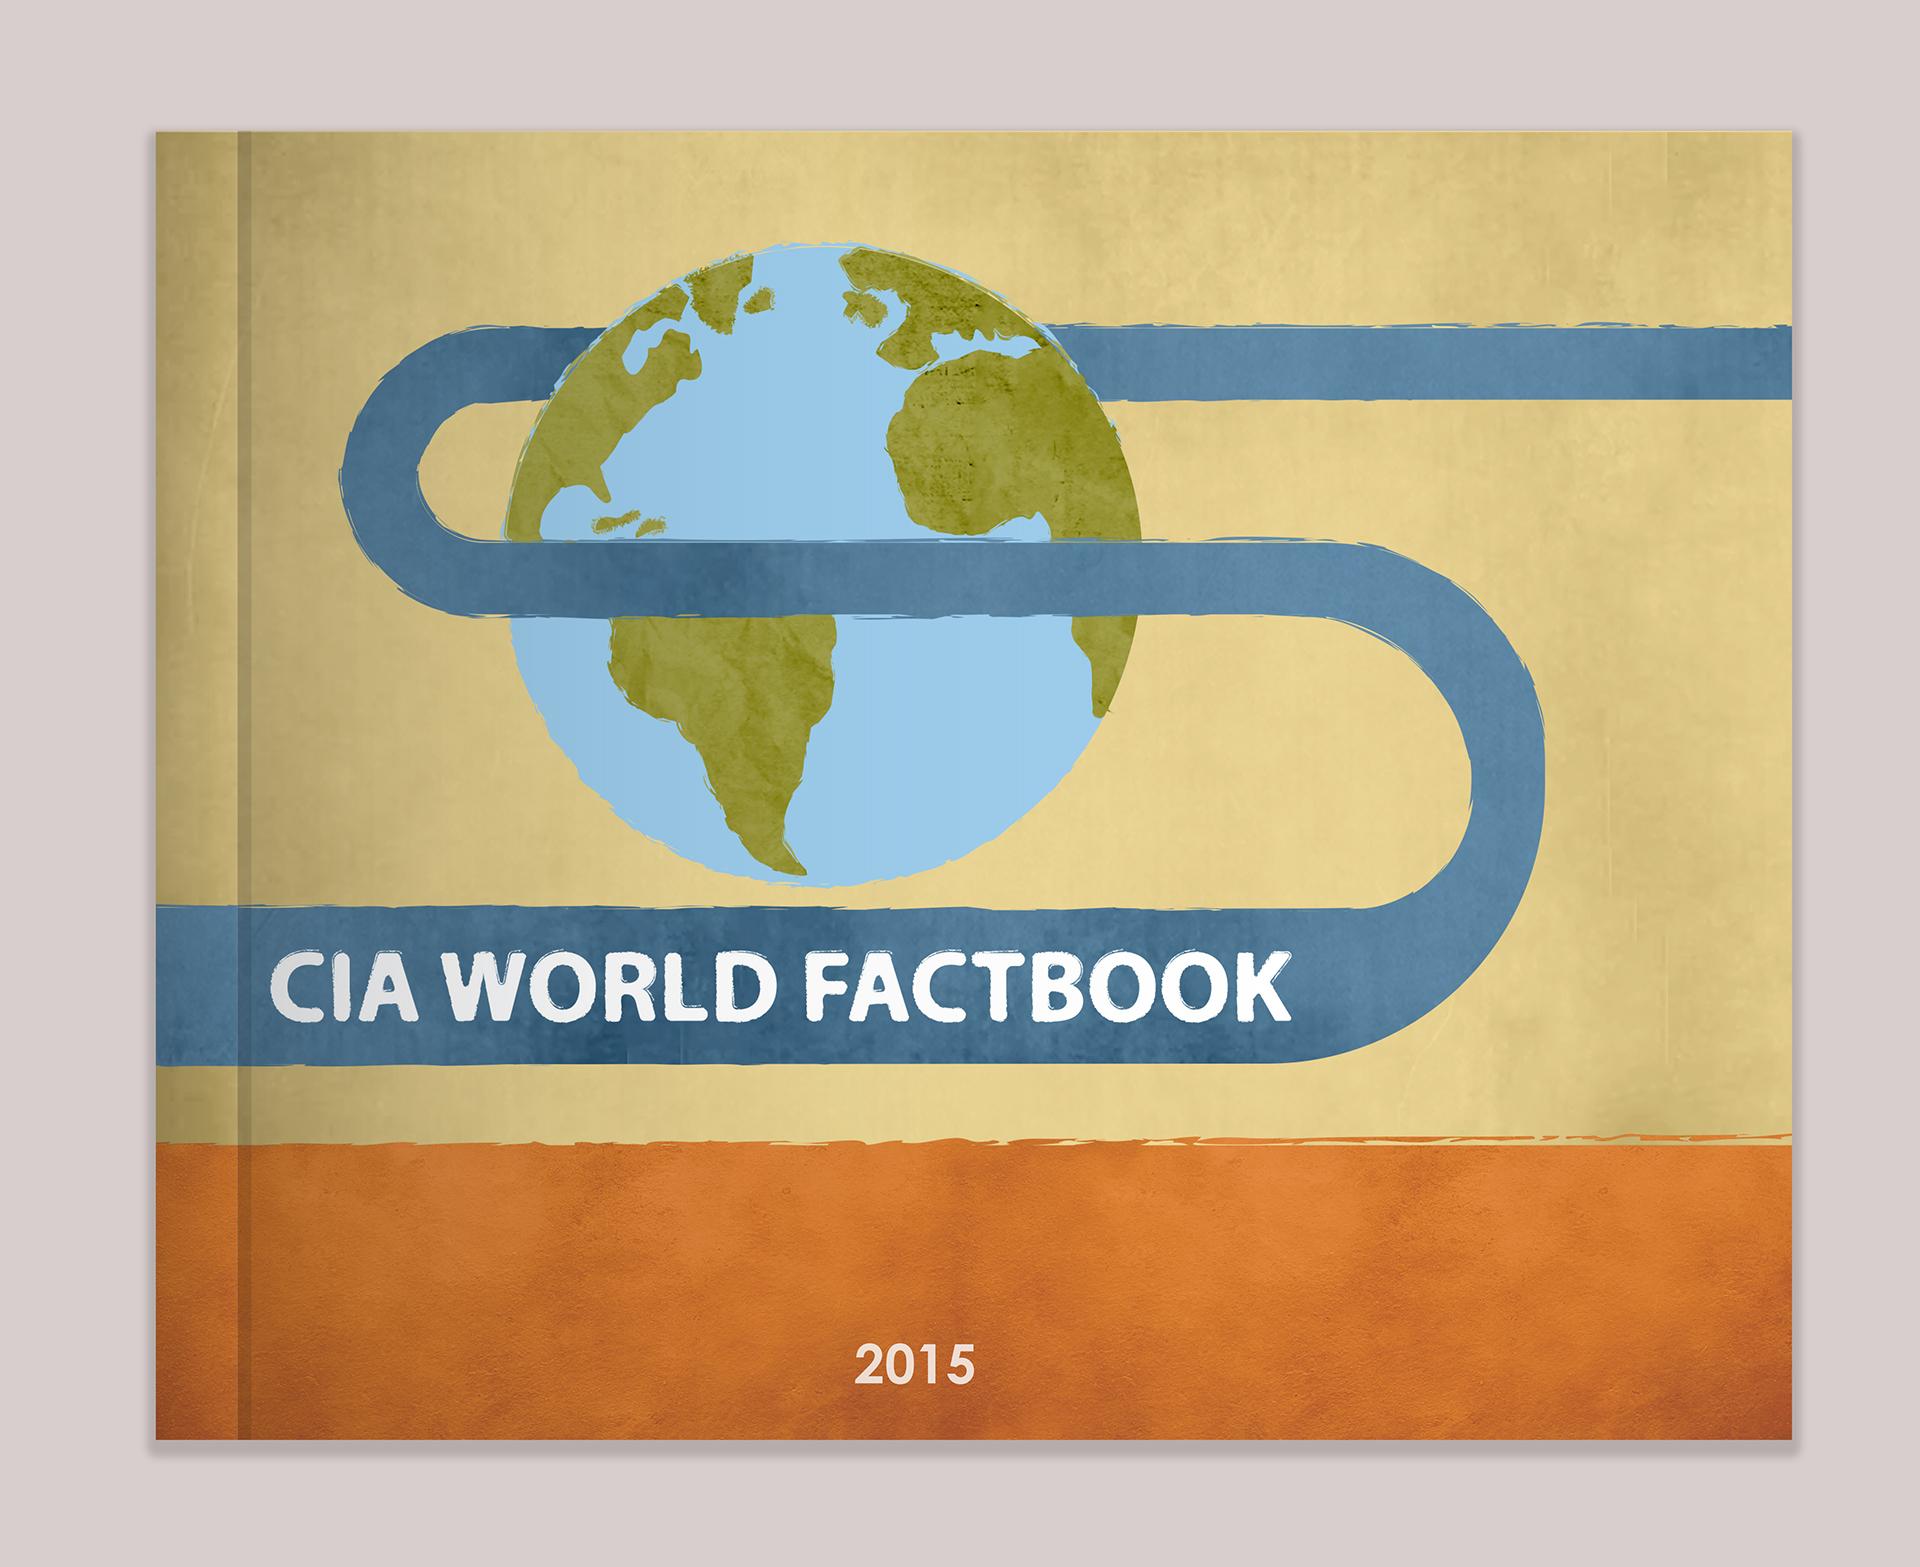 Using Cia World Factbook